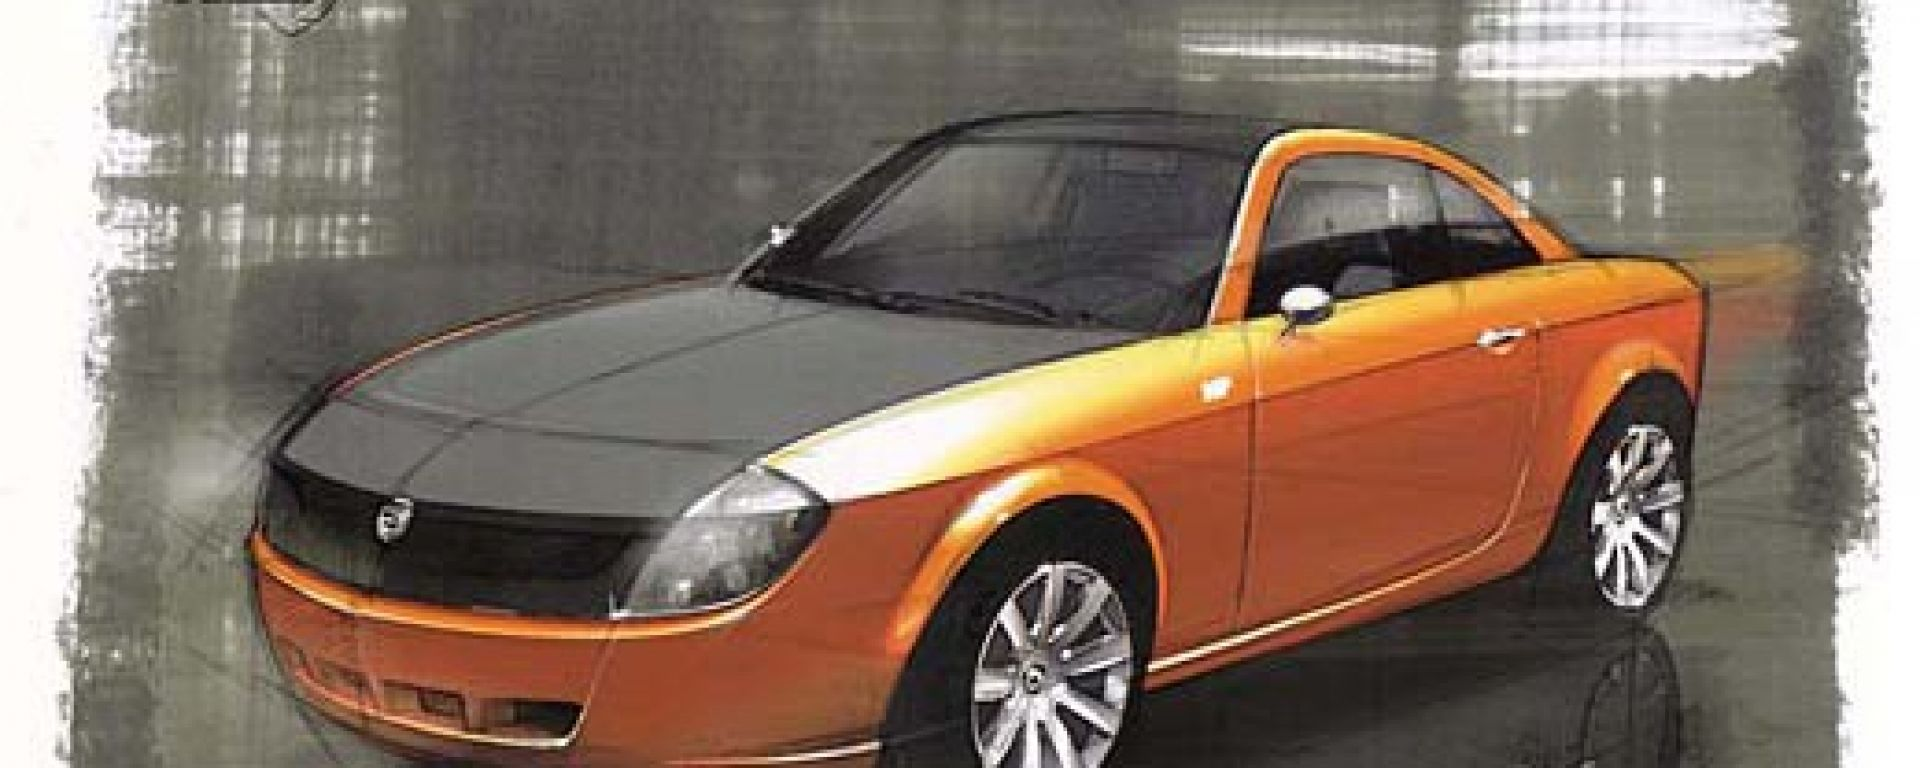 Anteprima: Lancia Fulvia Coupé 2004